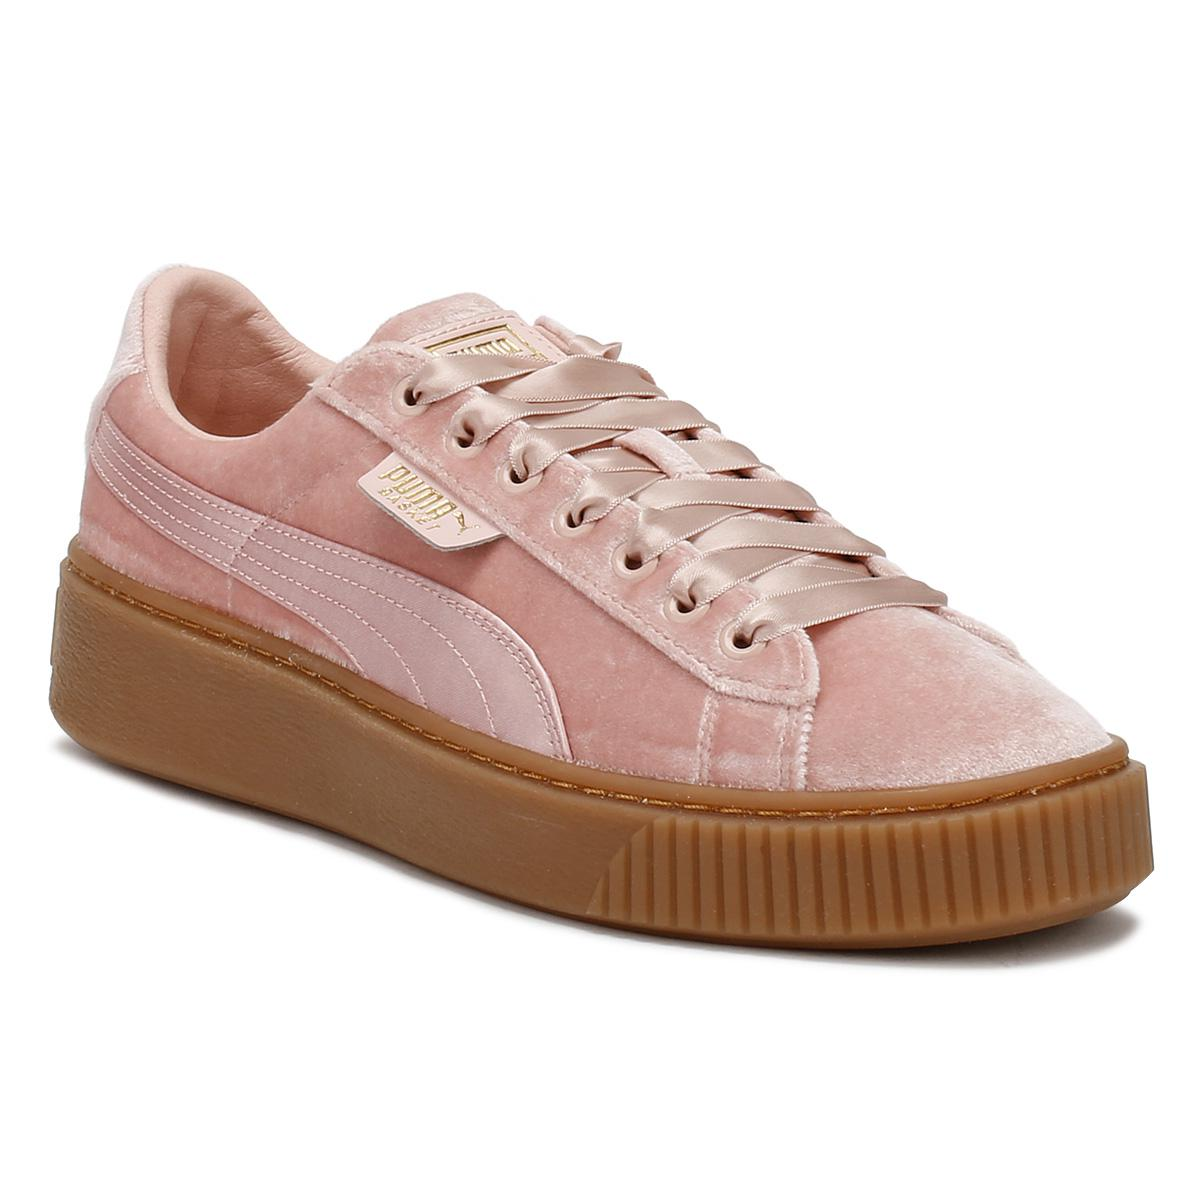 354fb14472dd PUMA Womens Pink   Gum Velvet Basket Platform Trainers Women s Shoes ...